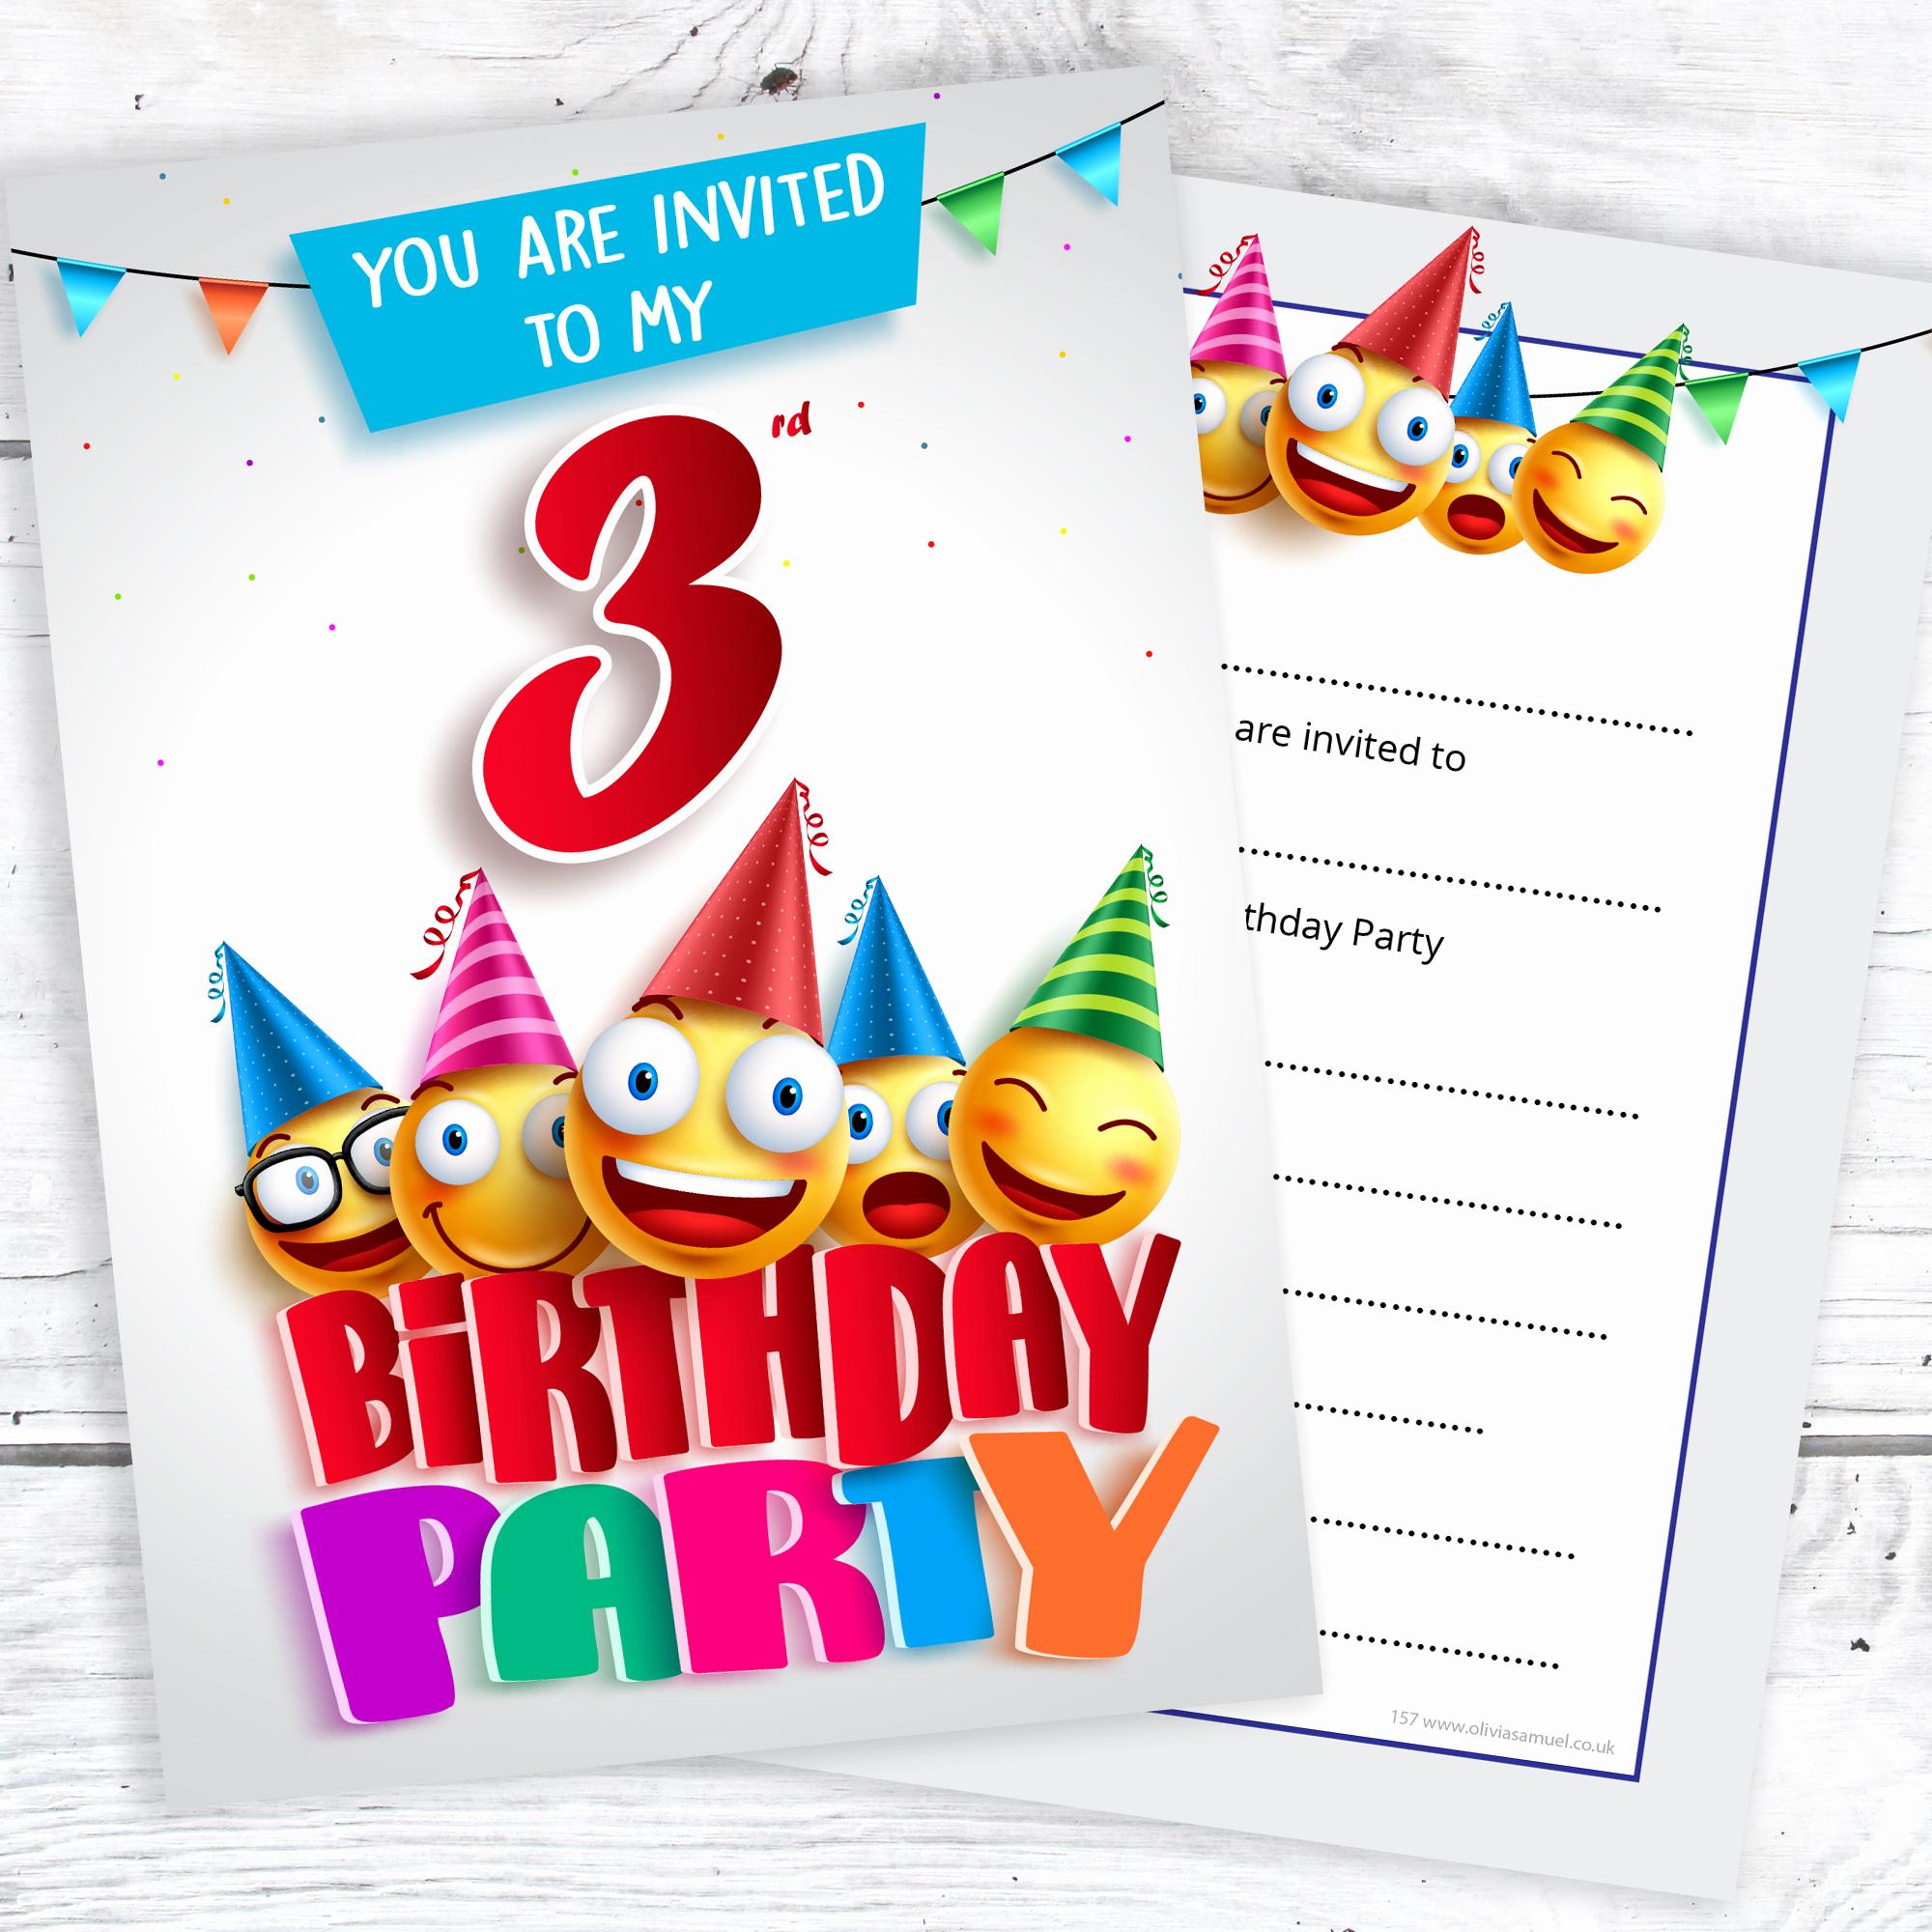 3rd Birthday Invitation Wording Best Of 3rd Birthday Party Invites – Emoji Style – Ready to Write